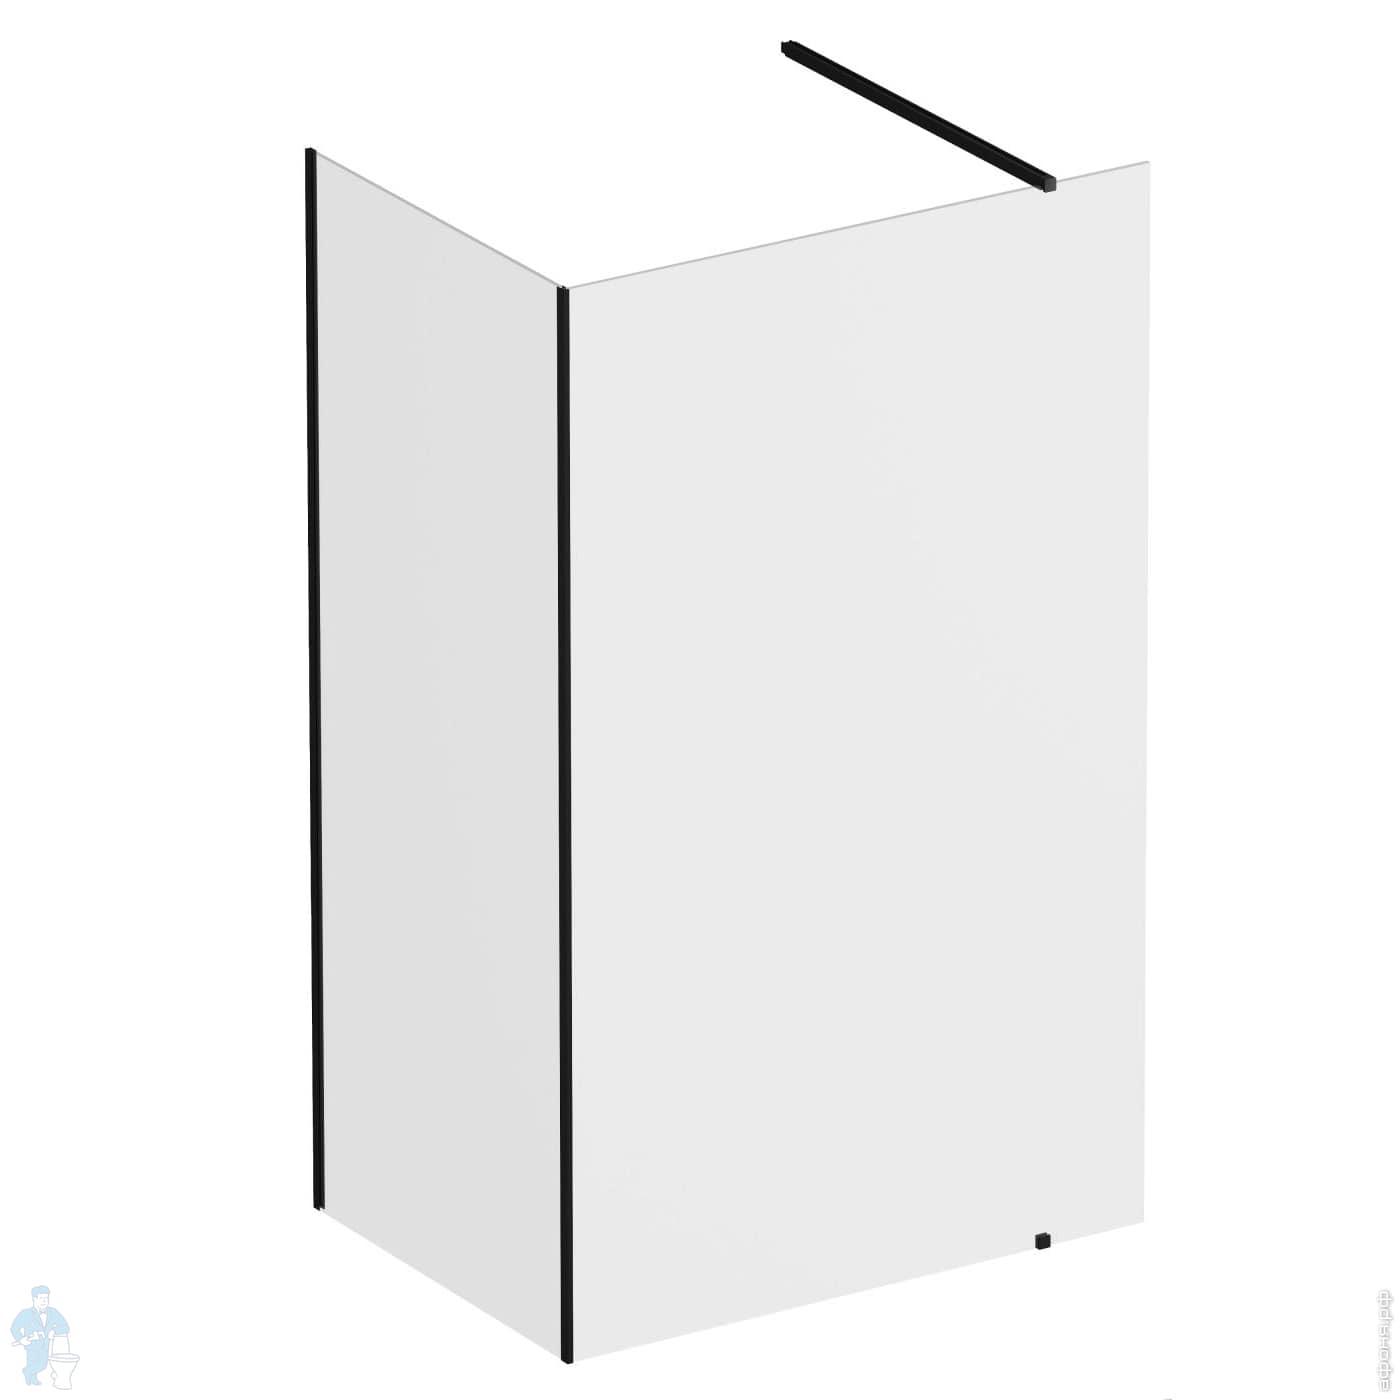 Душевой уголок RAVAK WALK-IN CORNER (1100х800х2000) стекло, черный+Transparent   Афоня.рф, цена 37 315 руб.